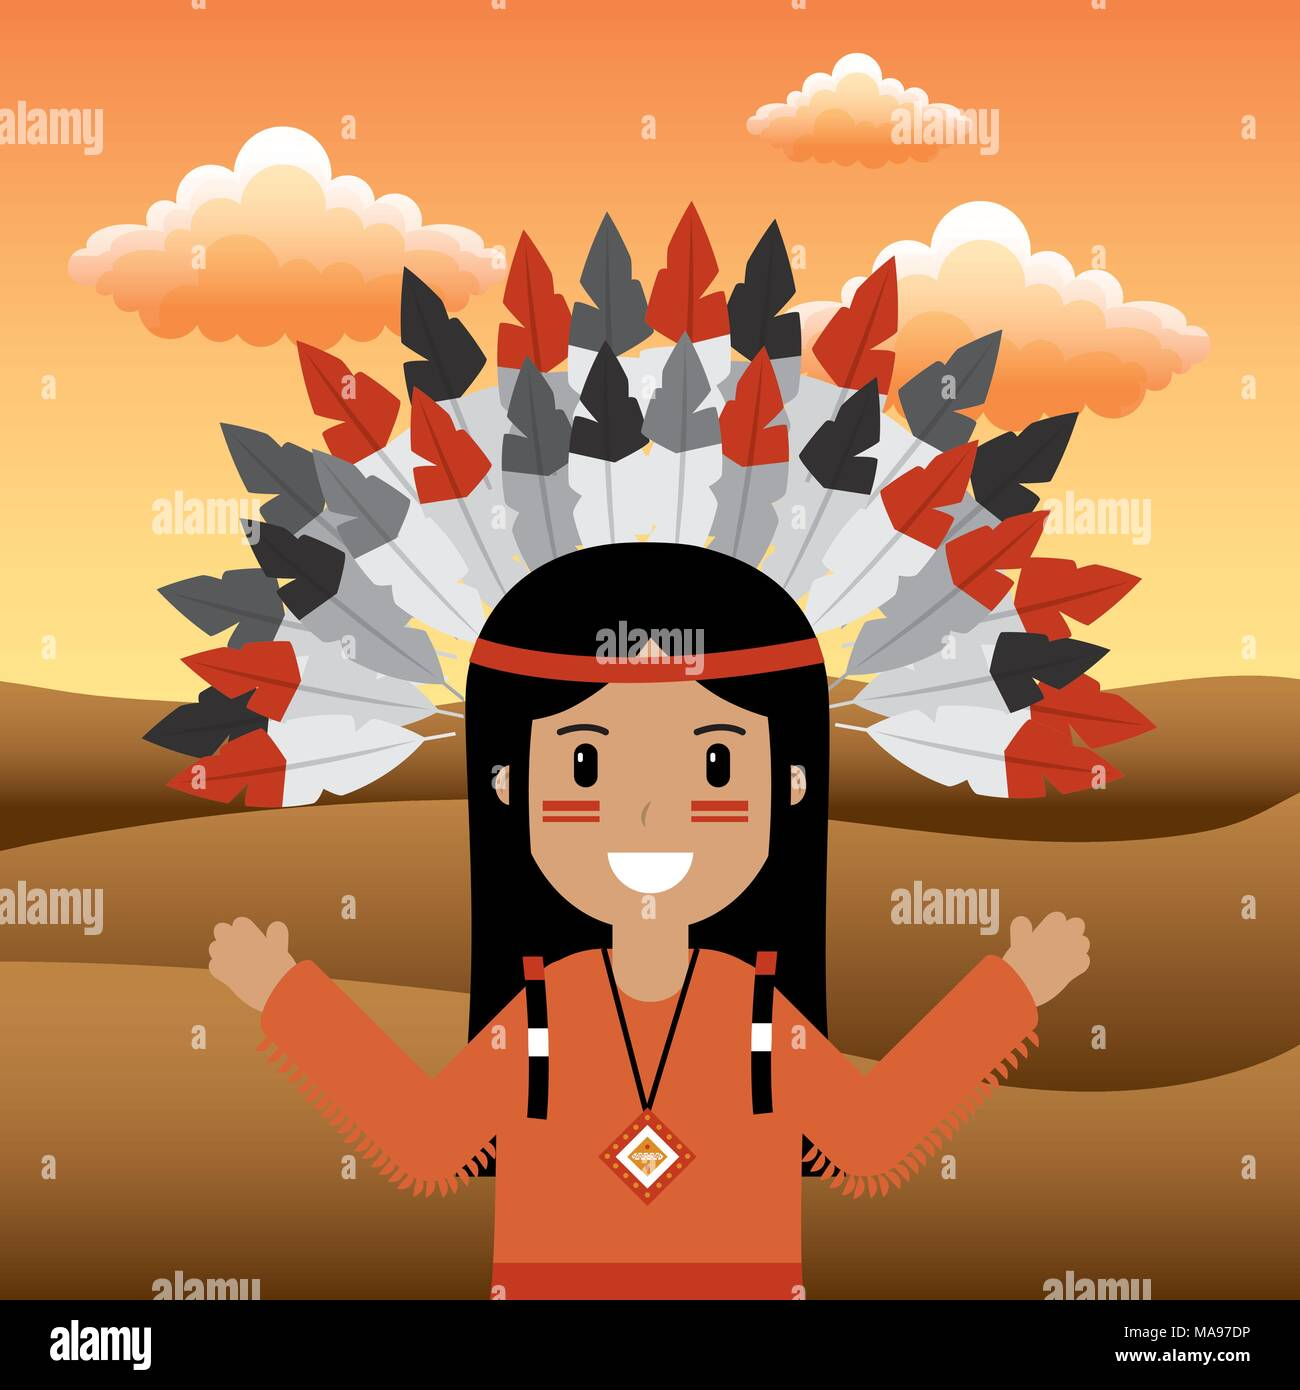 native american people cartoon - Stock Image